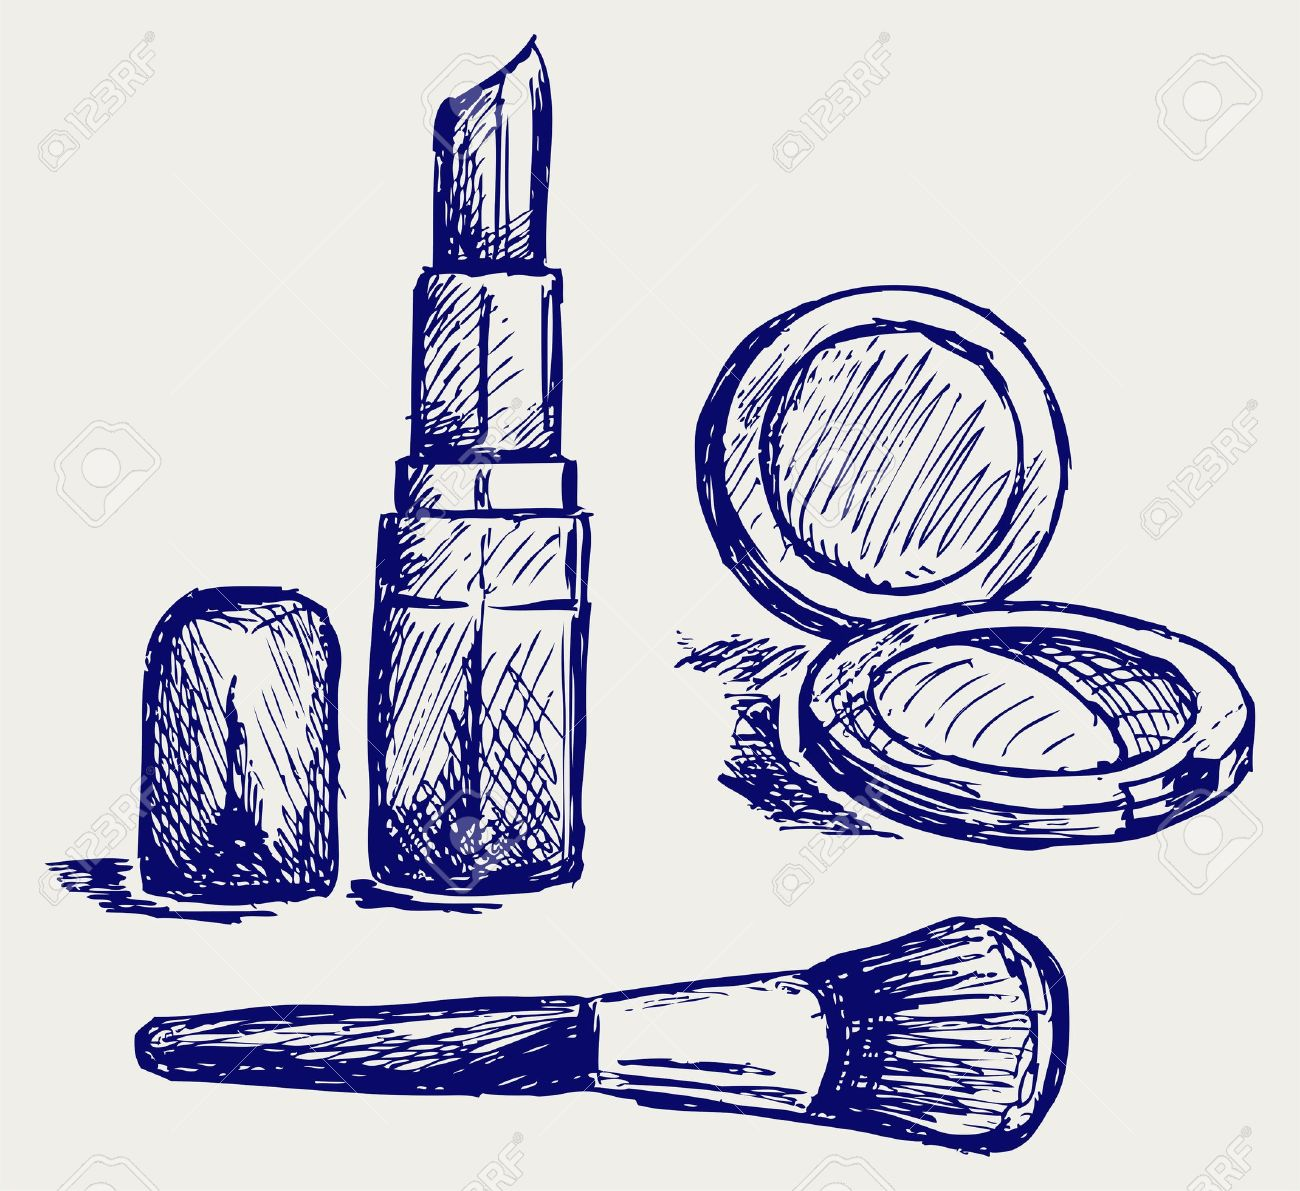 Cosmetics set, for fashion design - 15869053